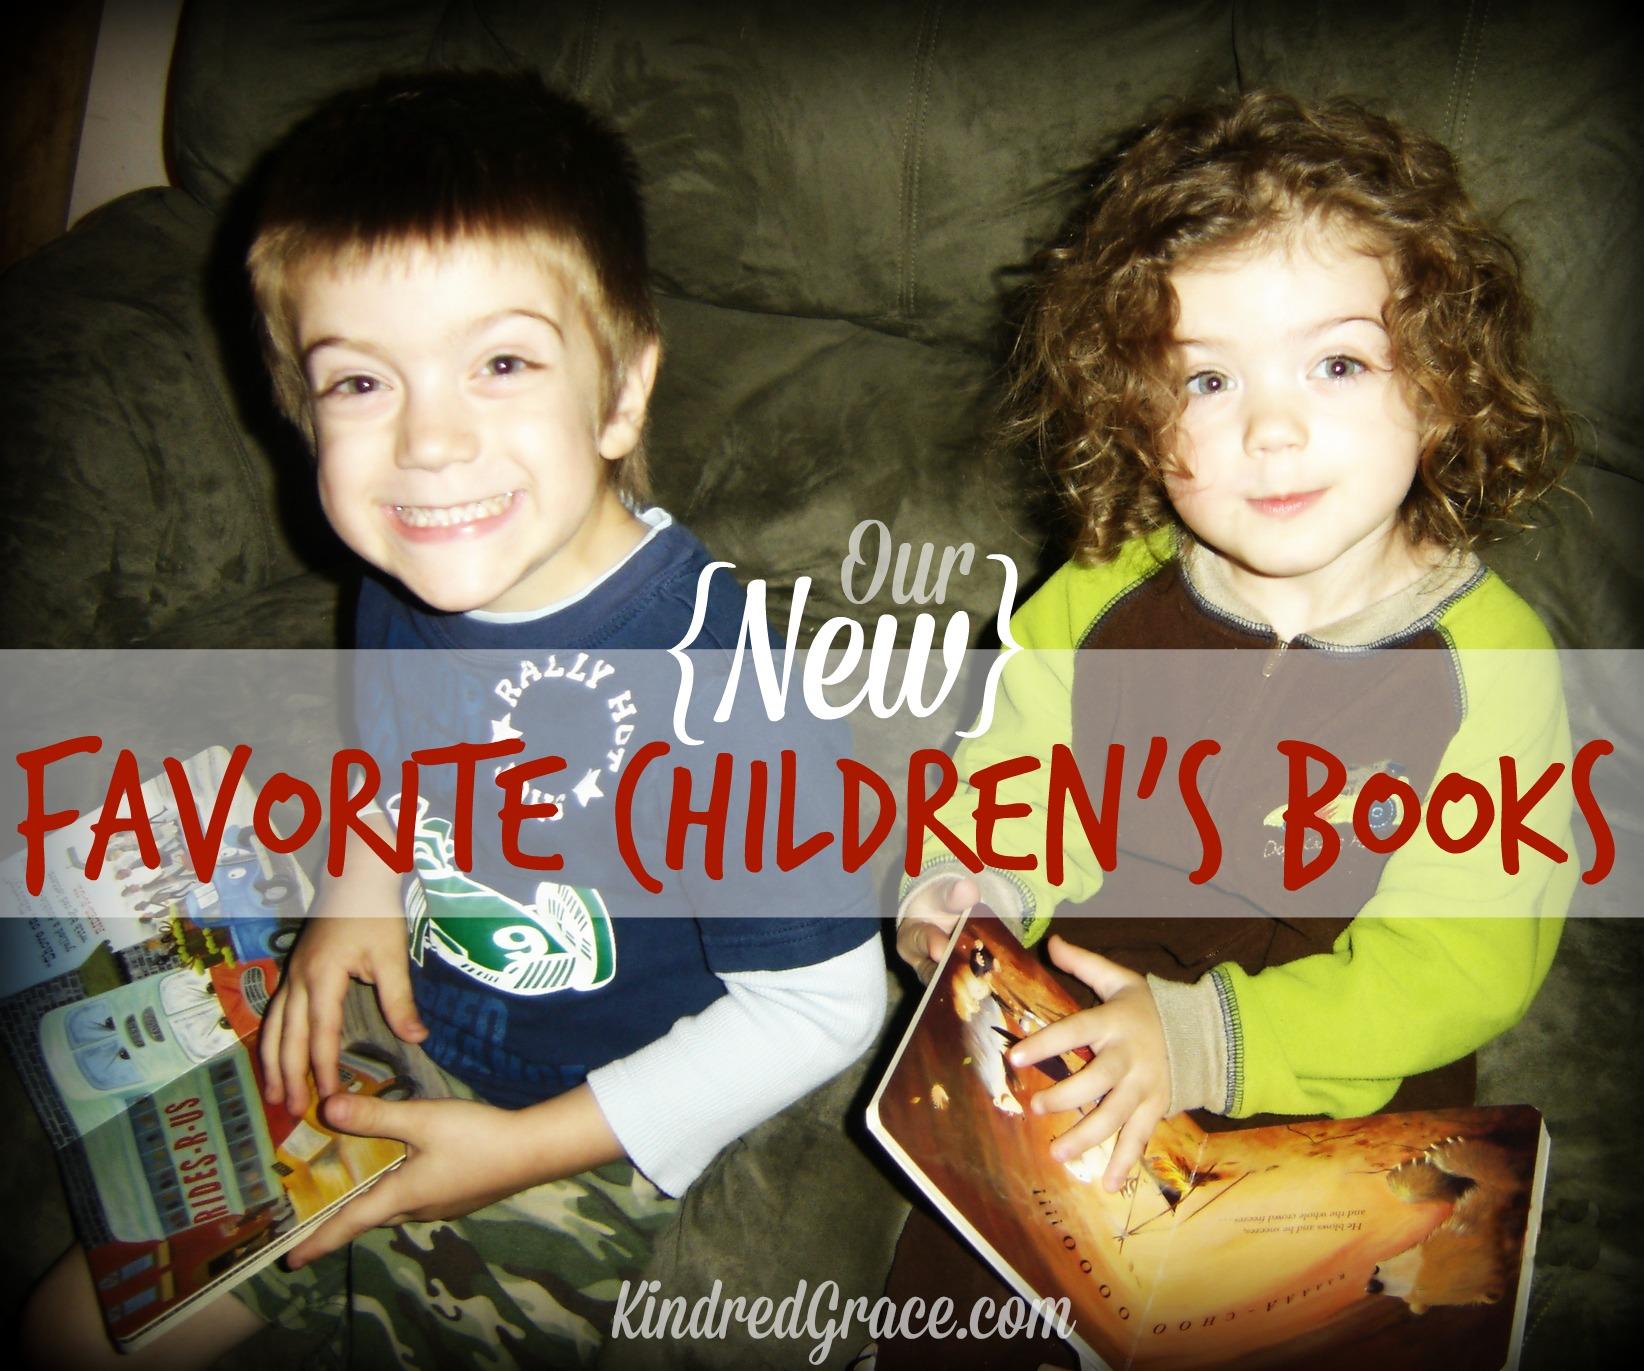 Our (new) Favorite Children's Books